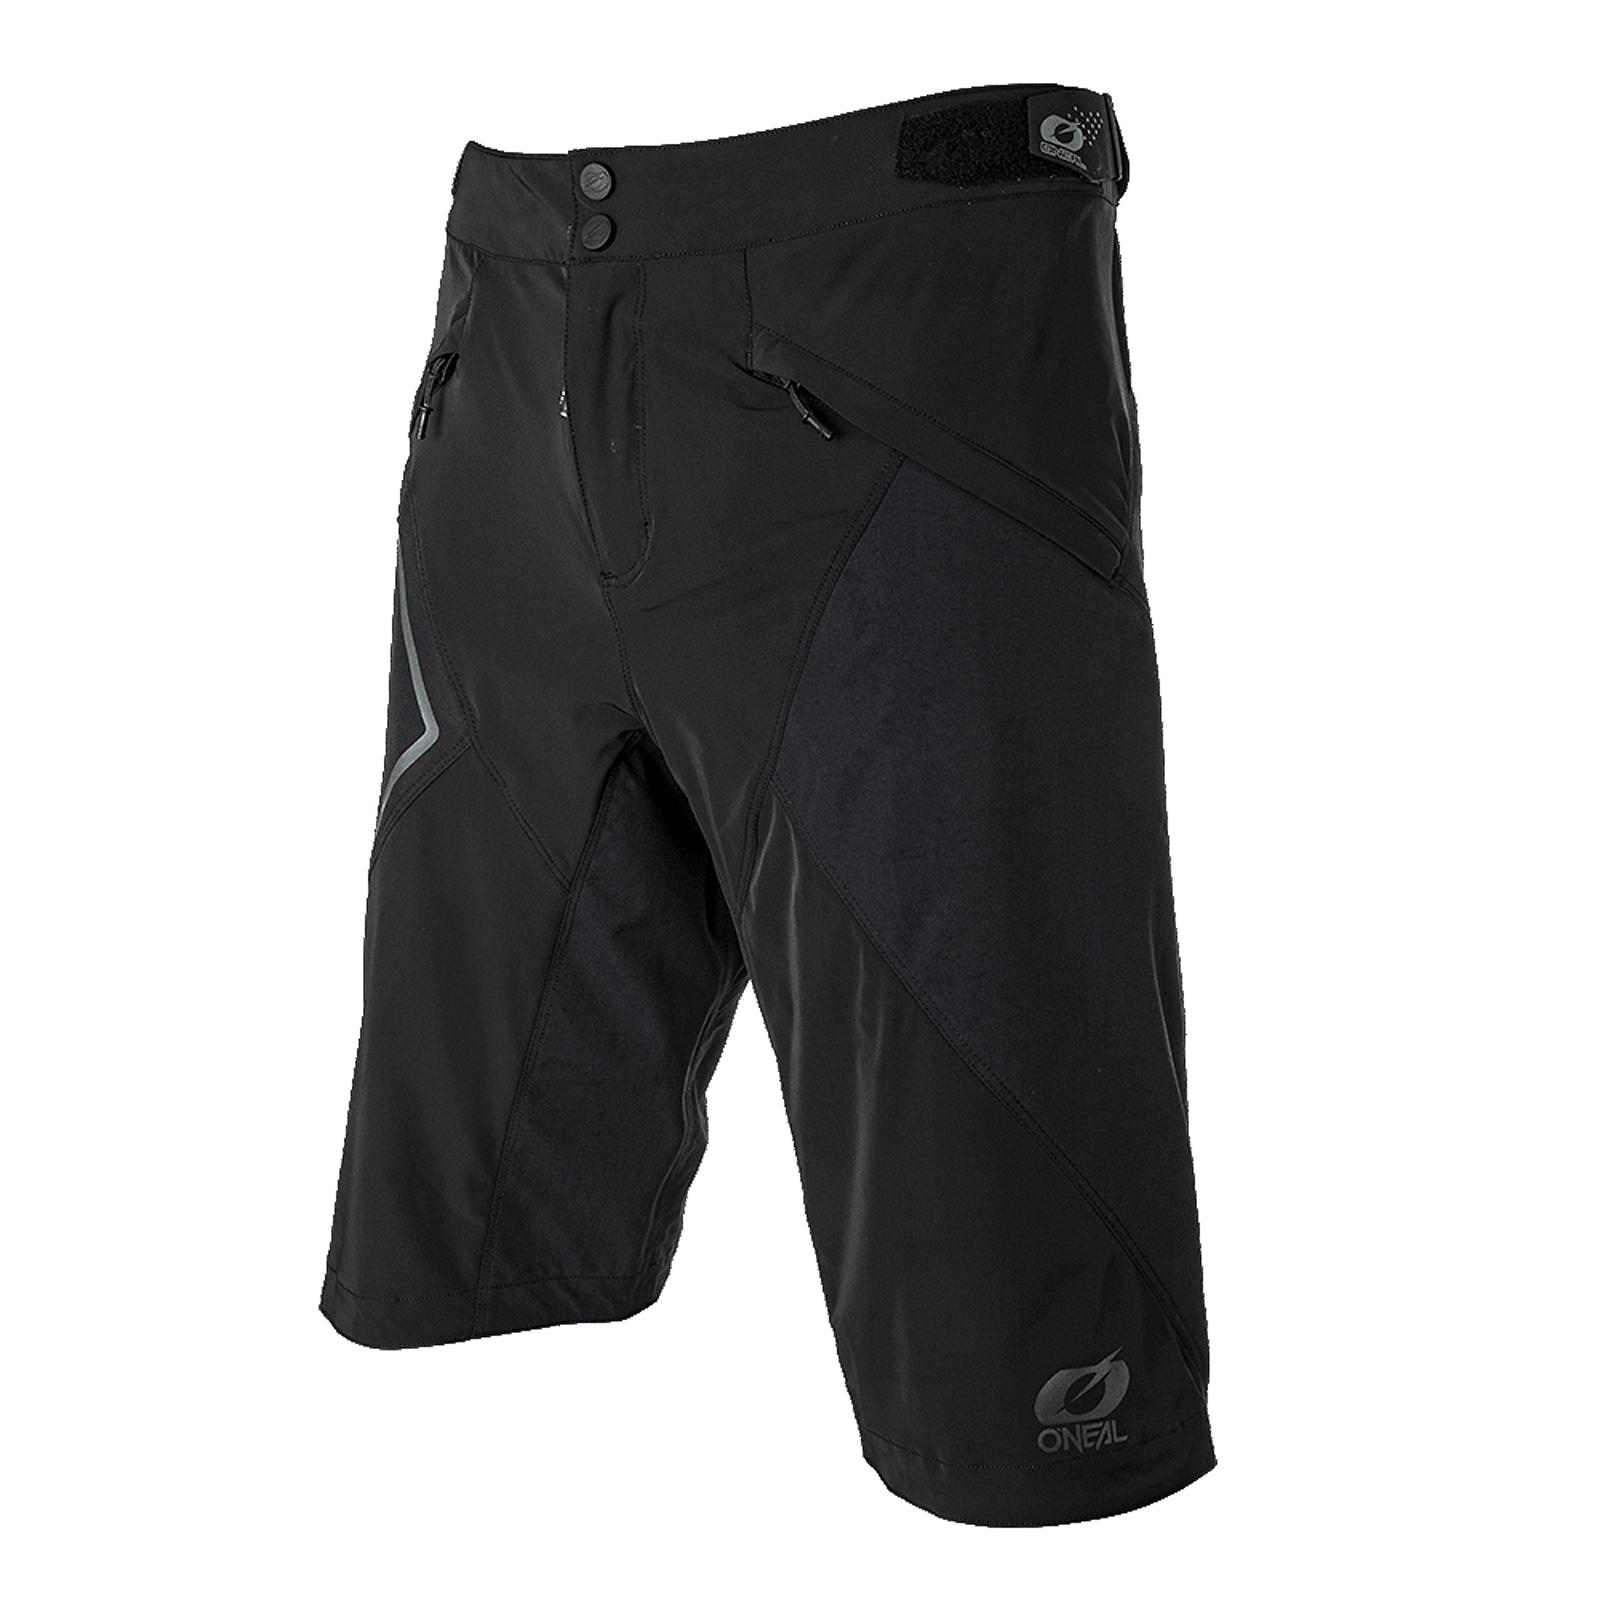 ONEAL All Mountain Mud Fahrrad Short Hose kurz schwarz 2020 Oneal